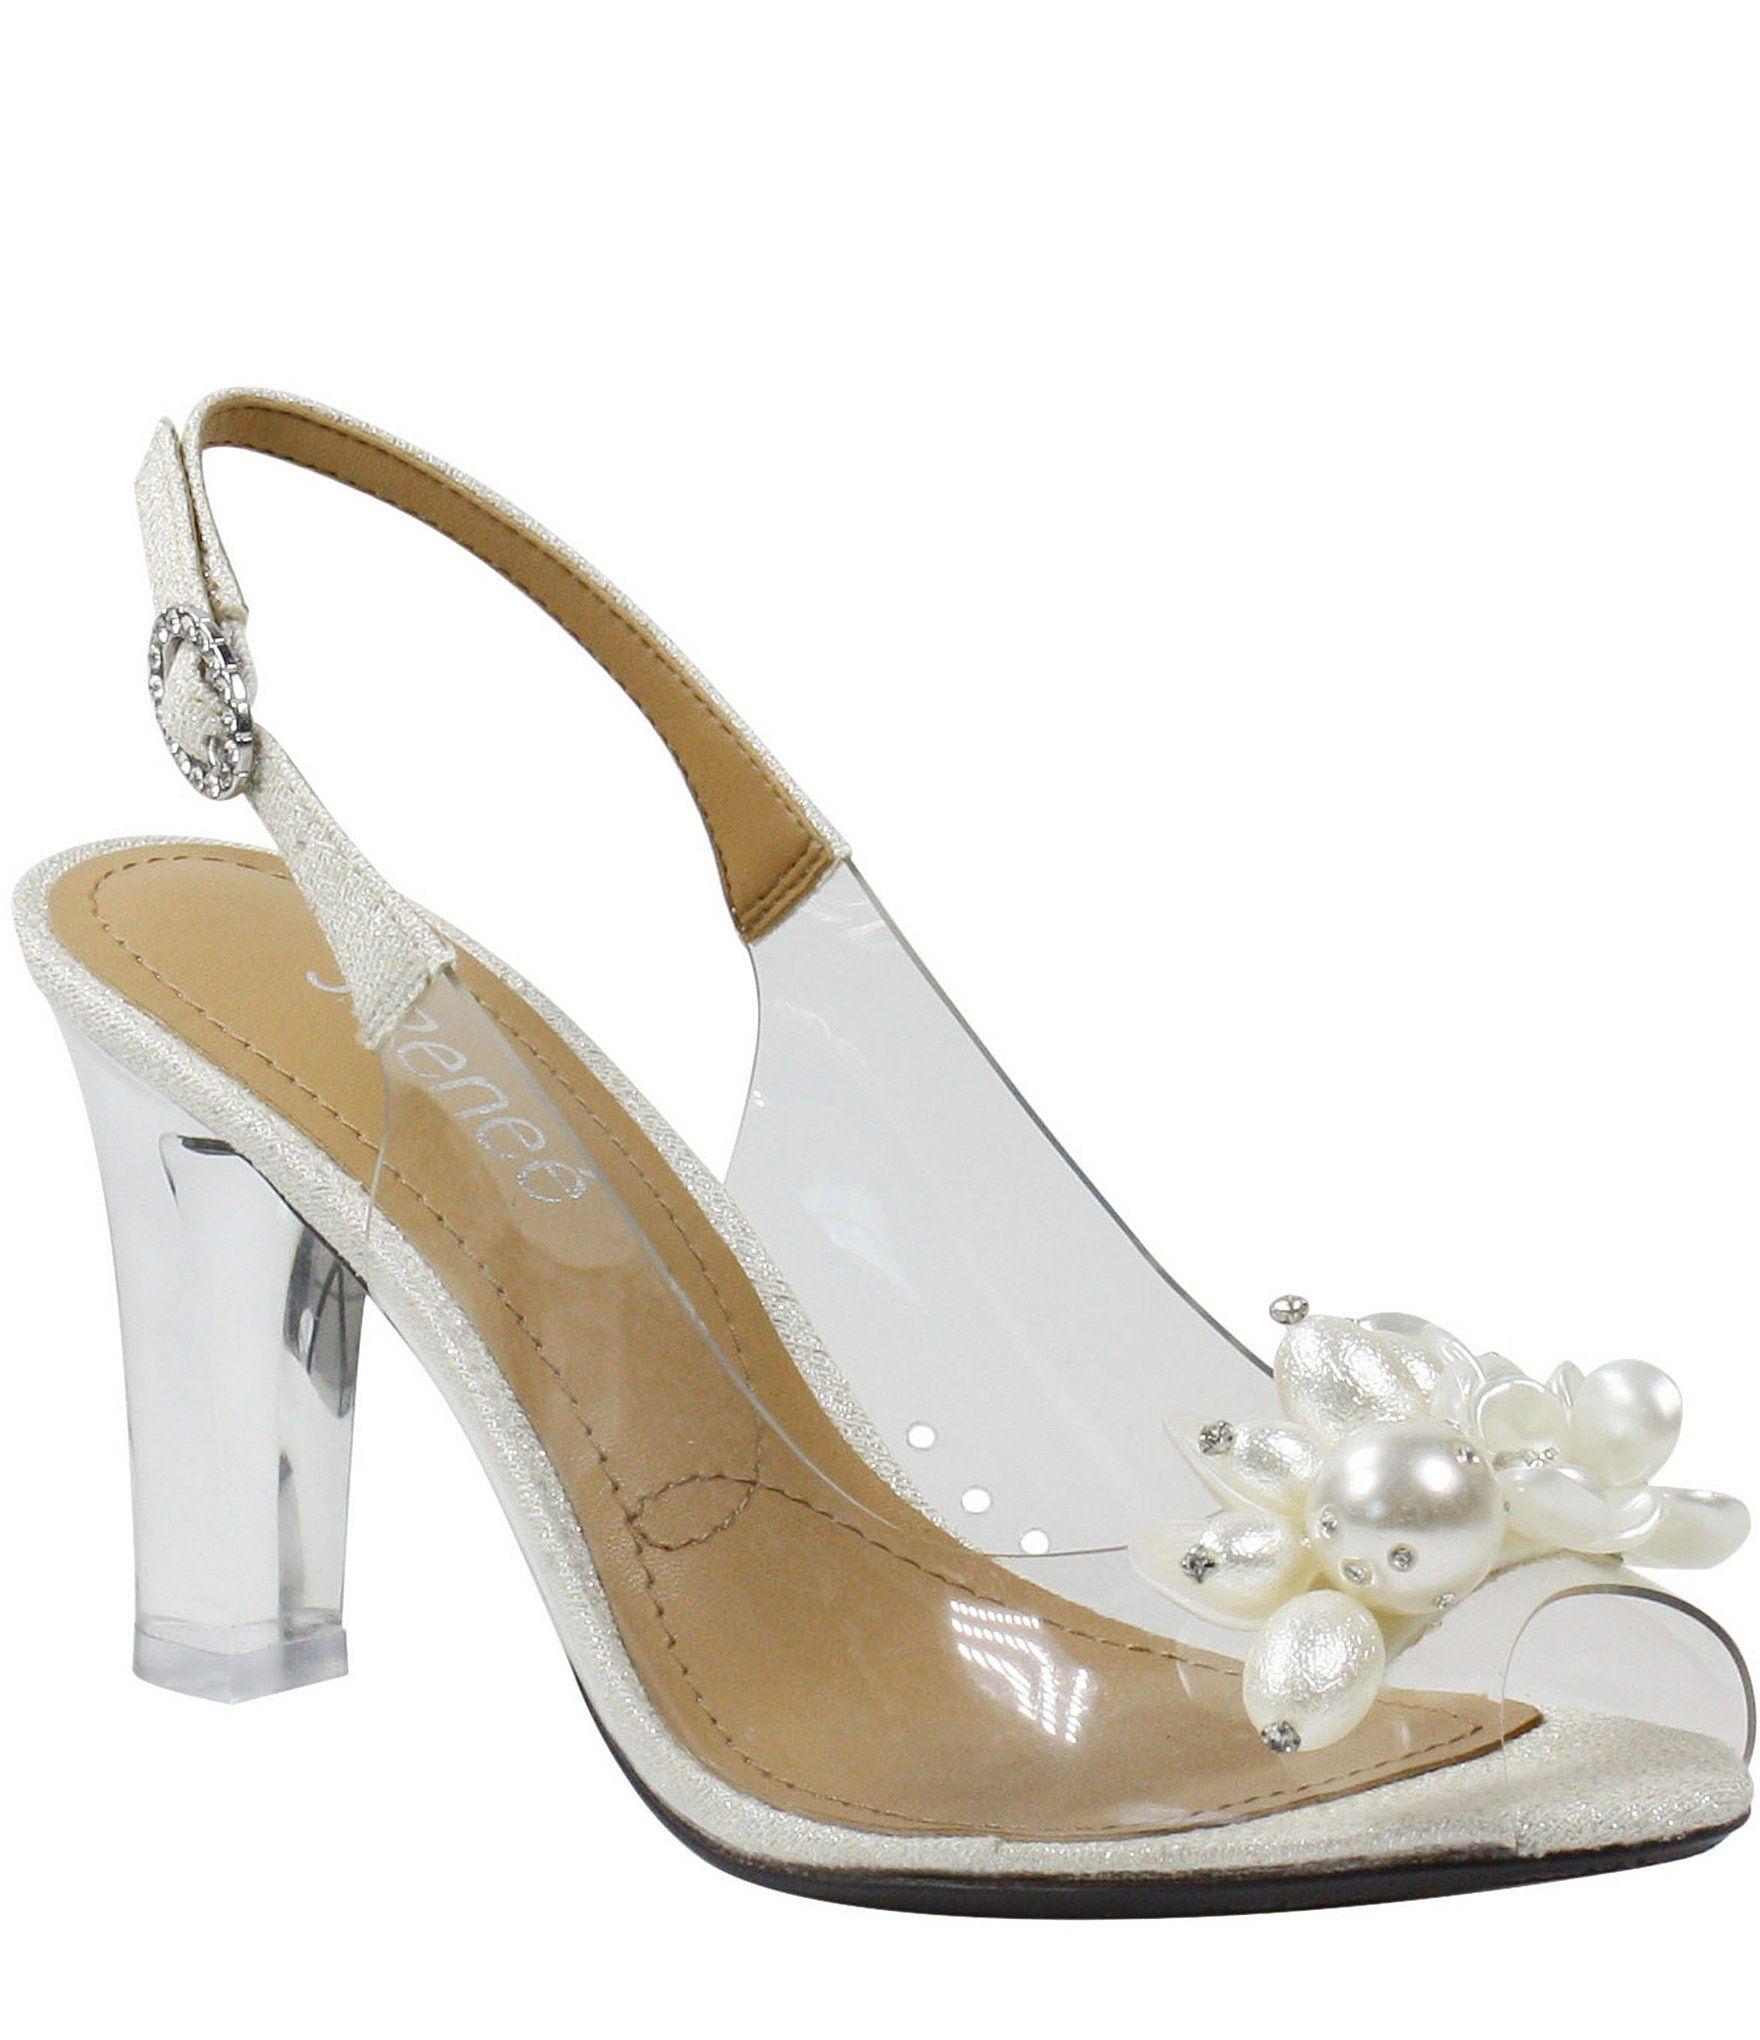 Dillards Wedding Gifts: J. Renee Drisana Sling Back Clear Pumps #Dillards